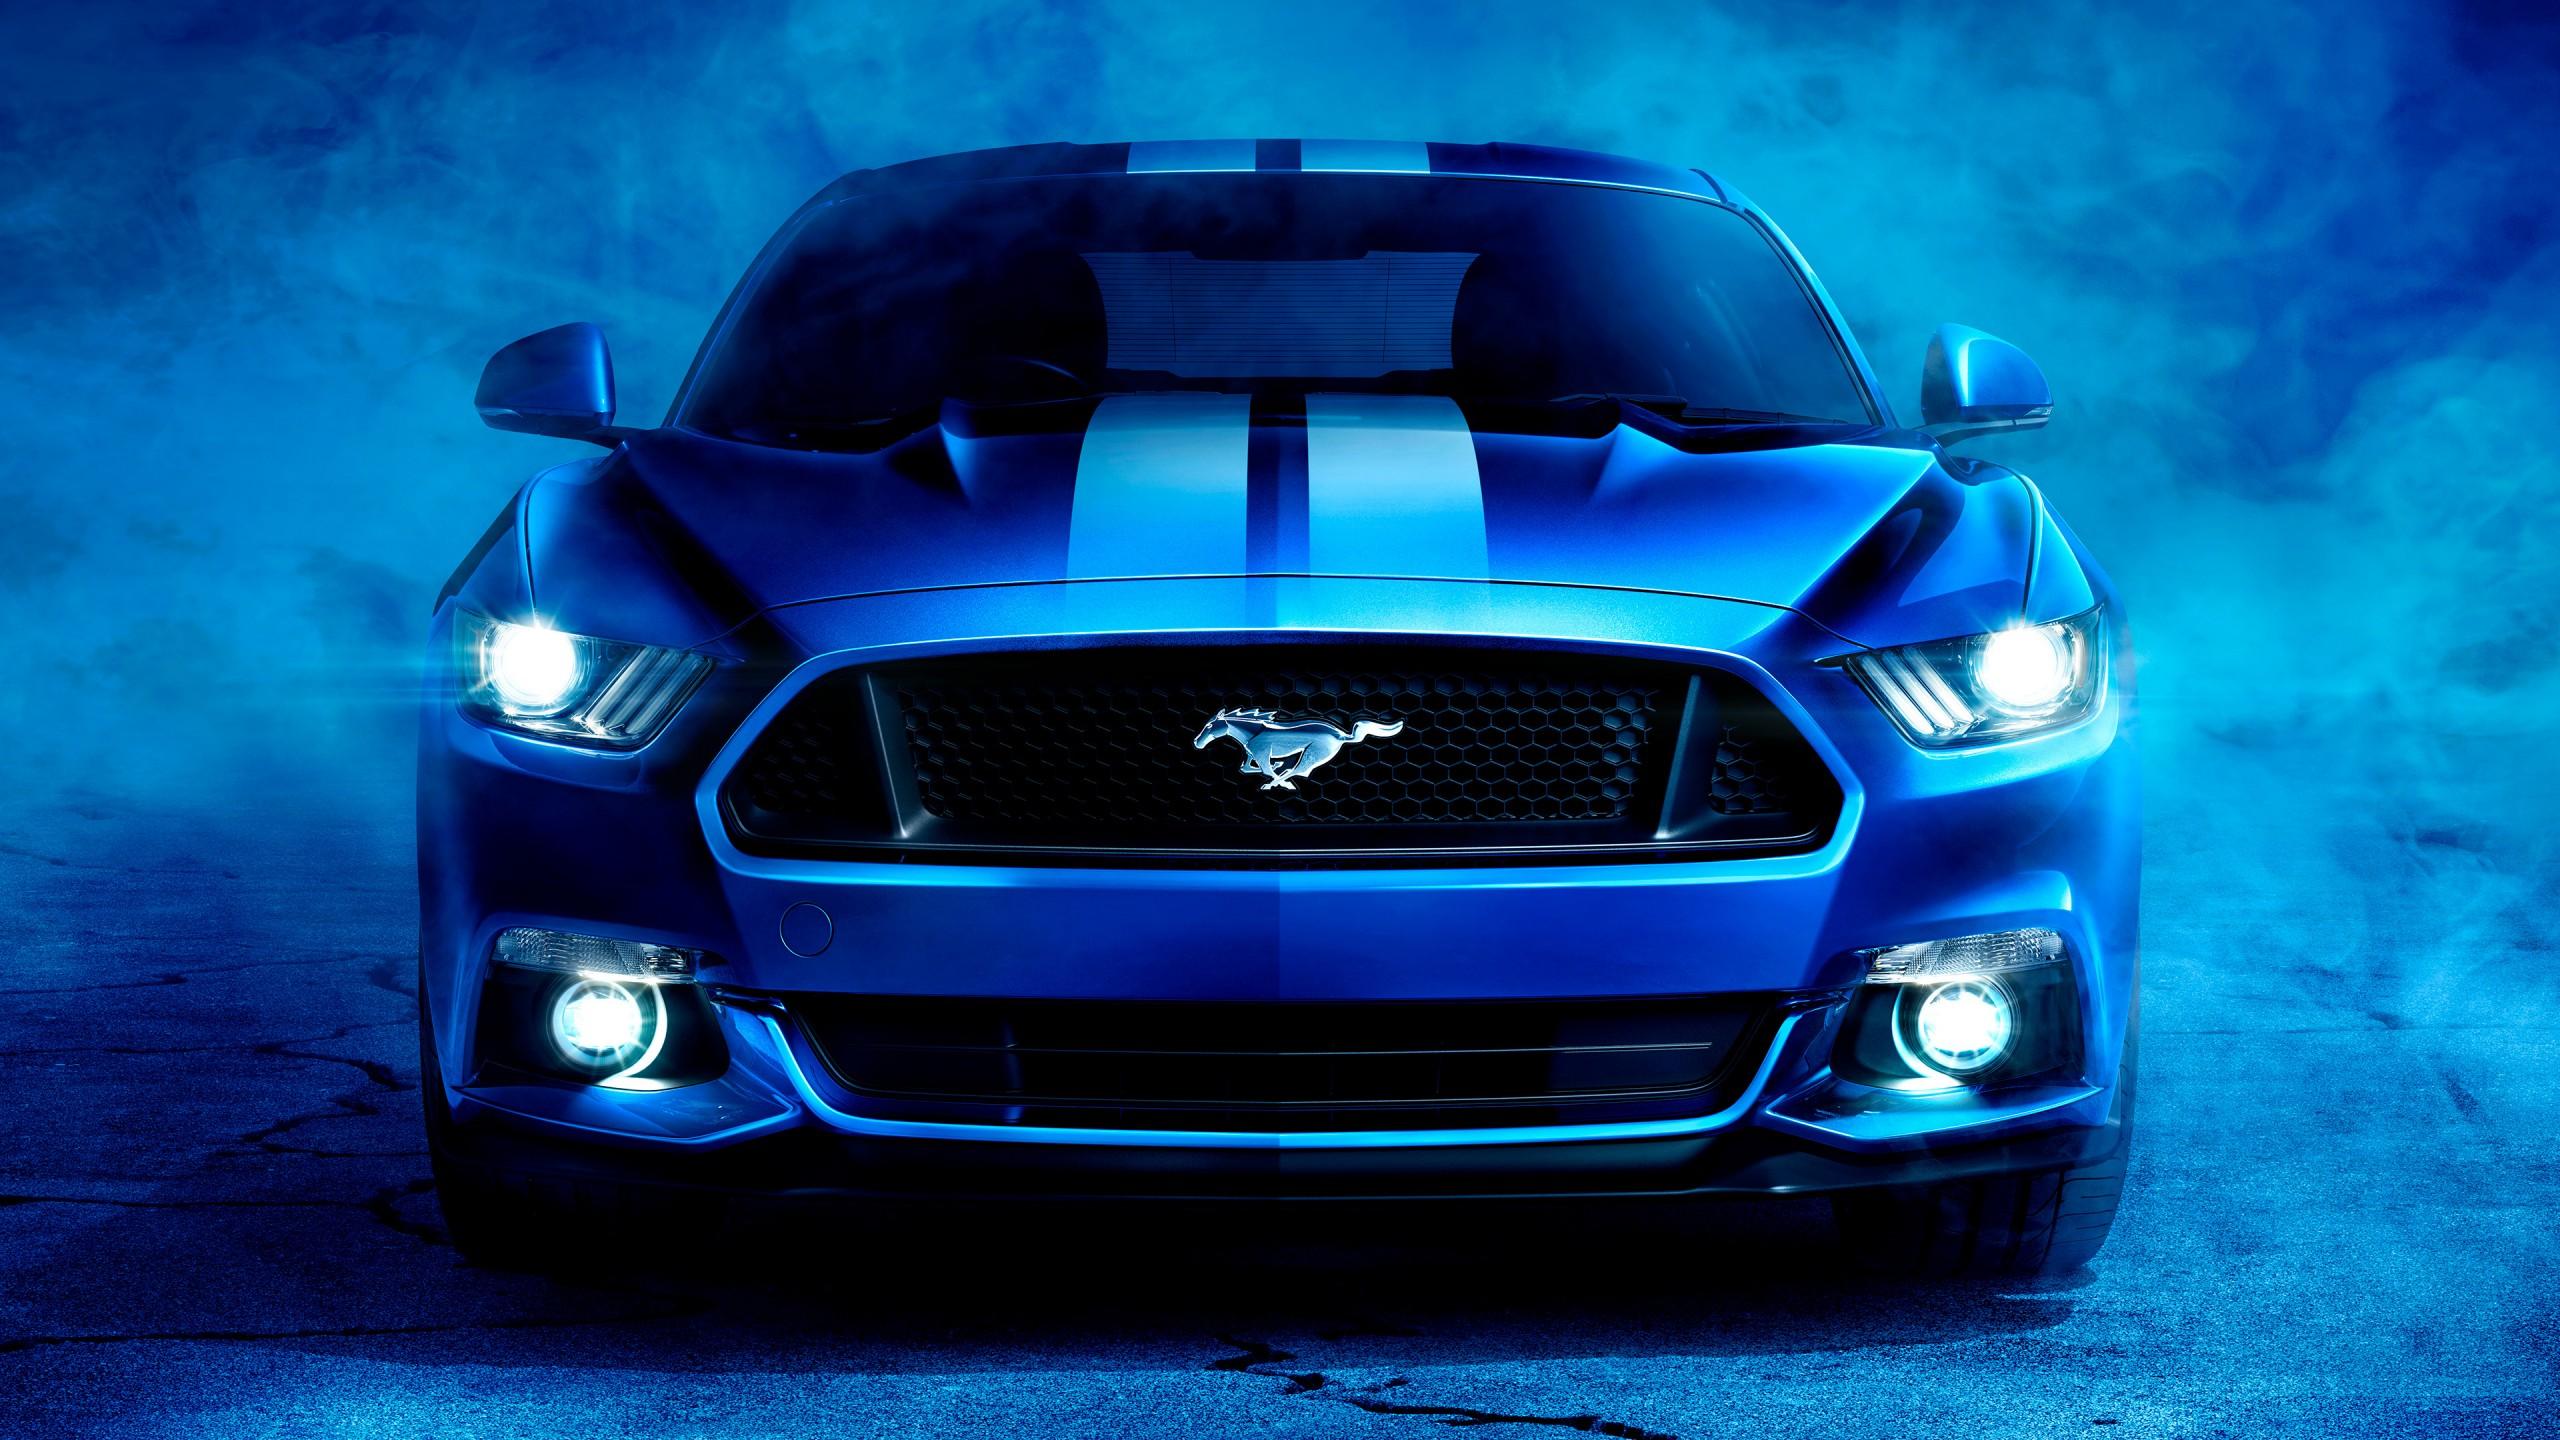 Ford Mustang 4K Wallpaper | HD Car Wallpapers | ID #11175